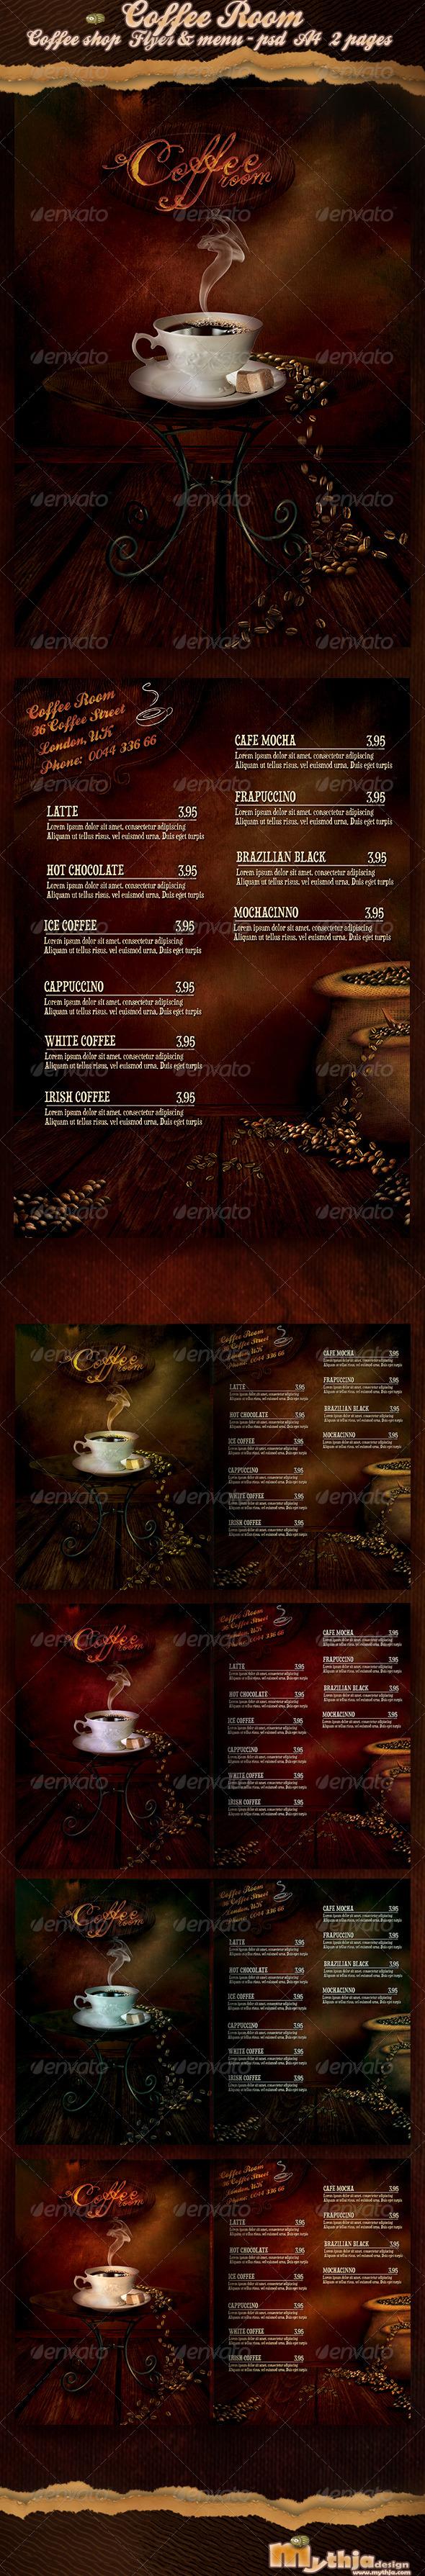 Coffee Room - Coffee Shop Flyer & Menu  - Food Menus Print Templates